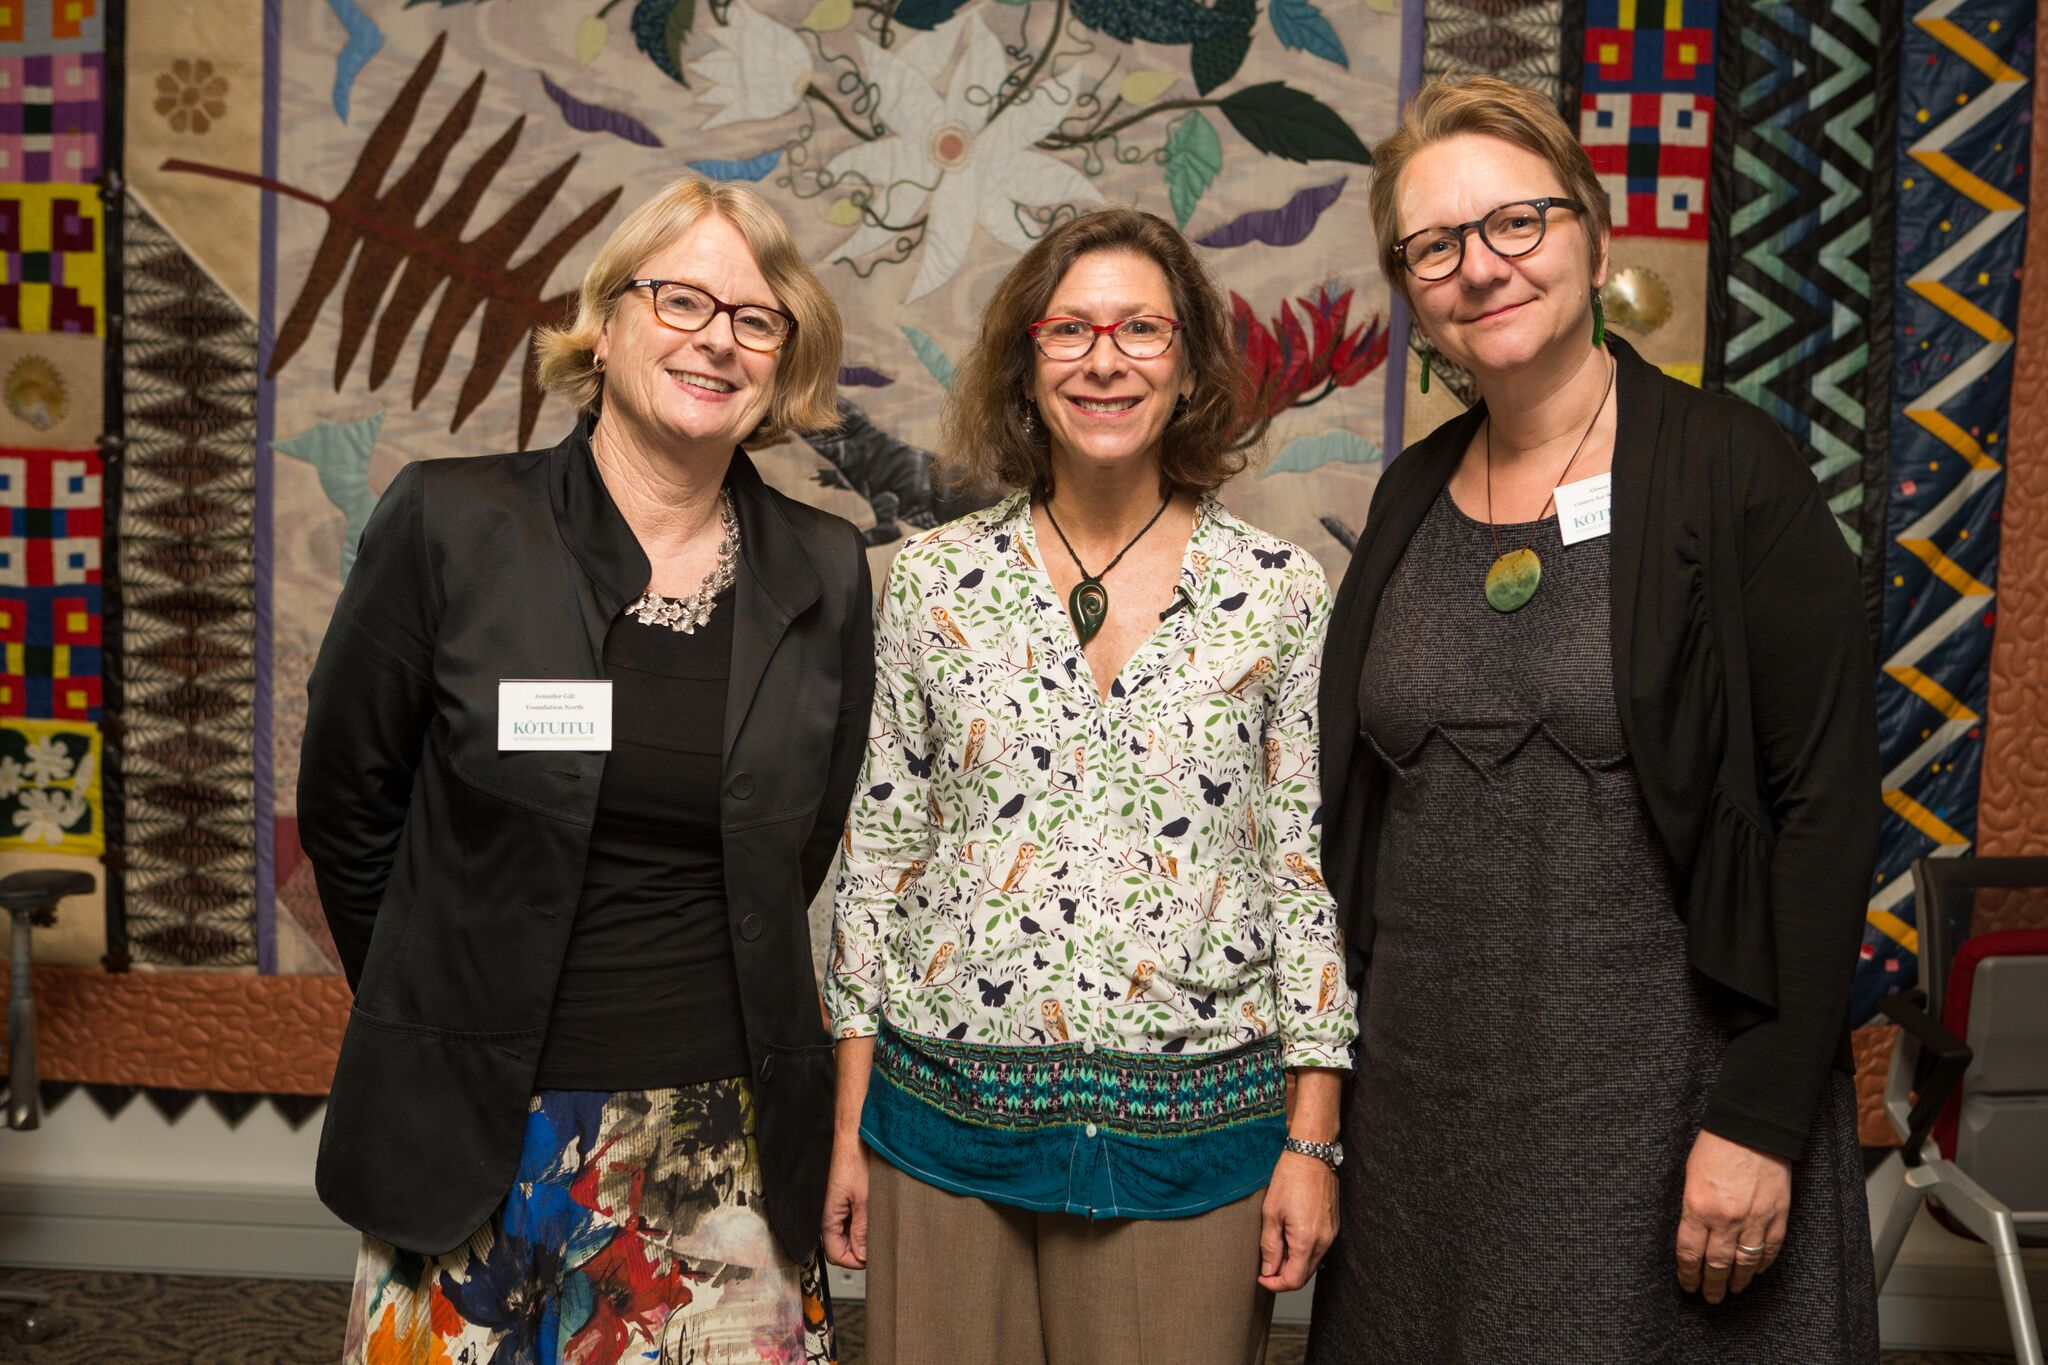 KŌTUITUI interweaving conversations about social enterprise in New Zealand